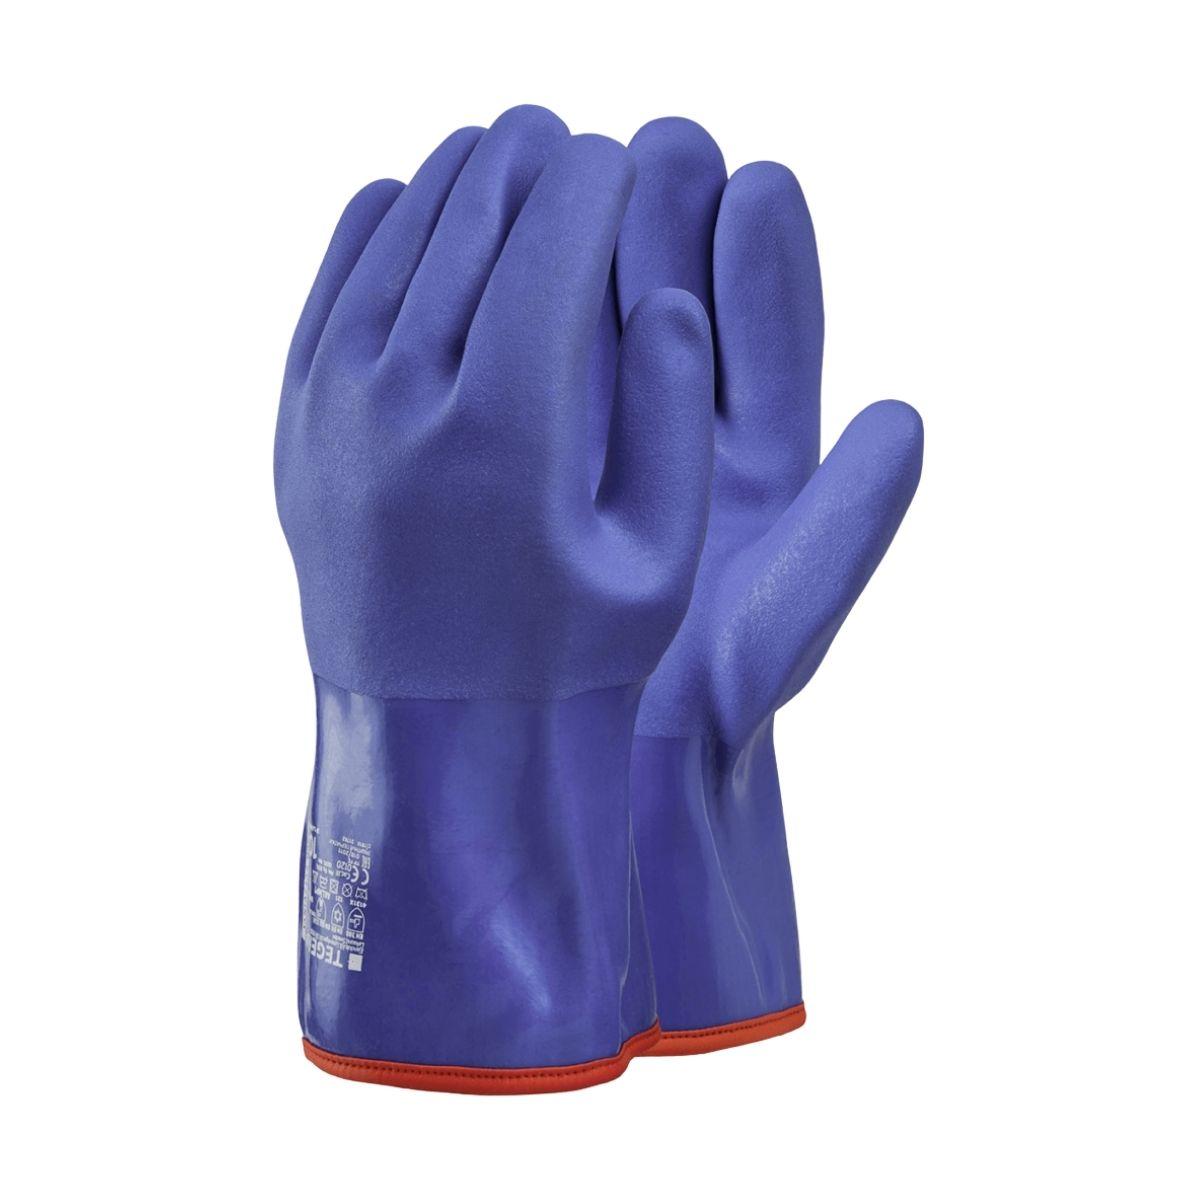 GL9394 Vyflex Boa Lined Blue PVC, Gauntlet, 35cm Long